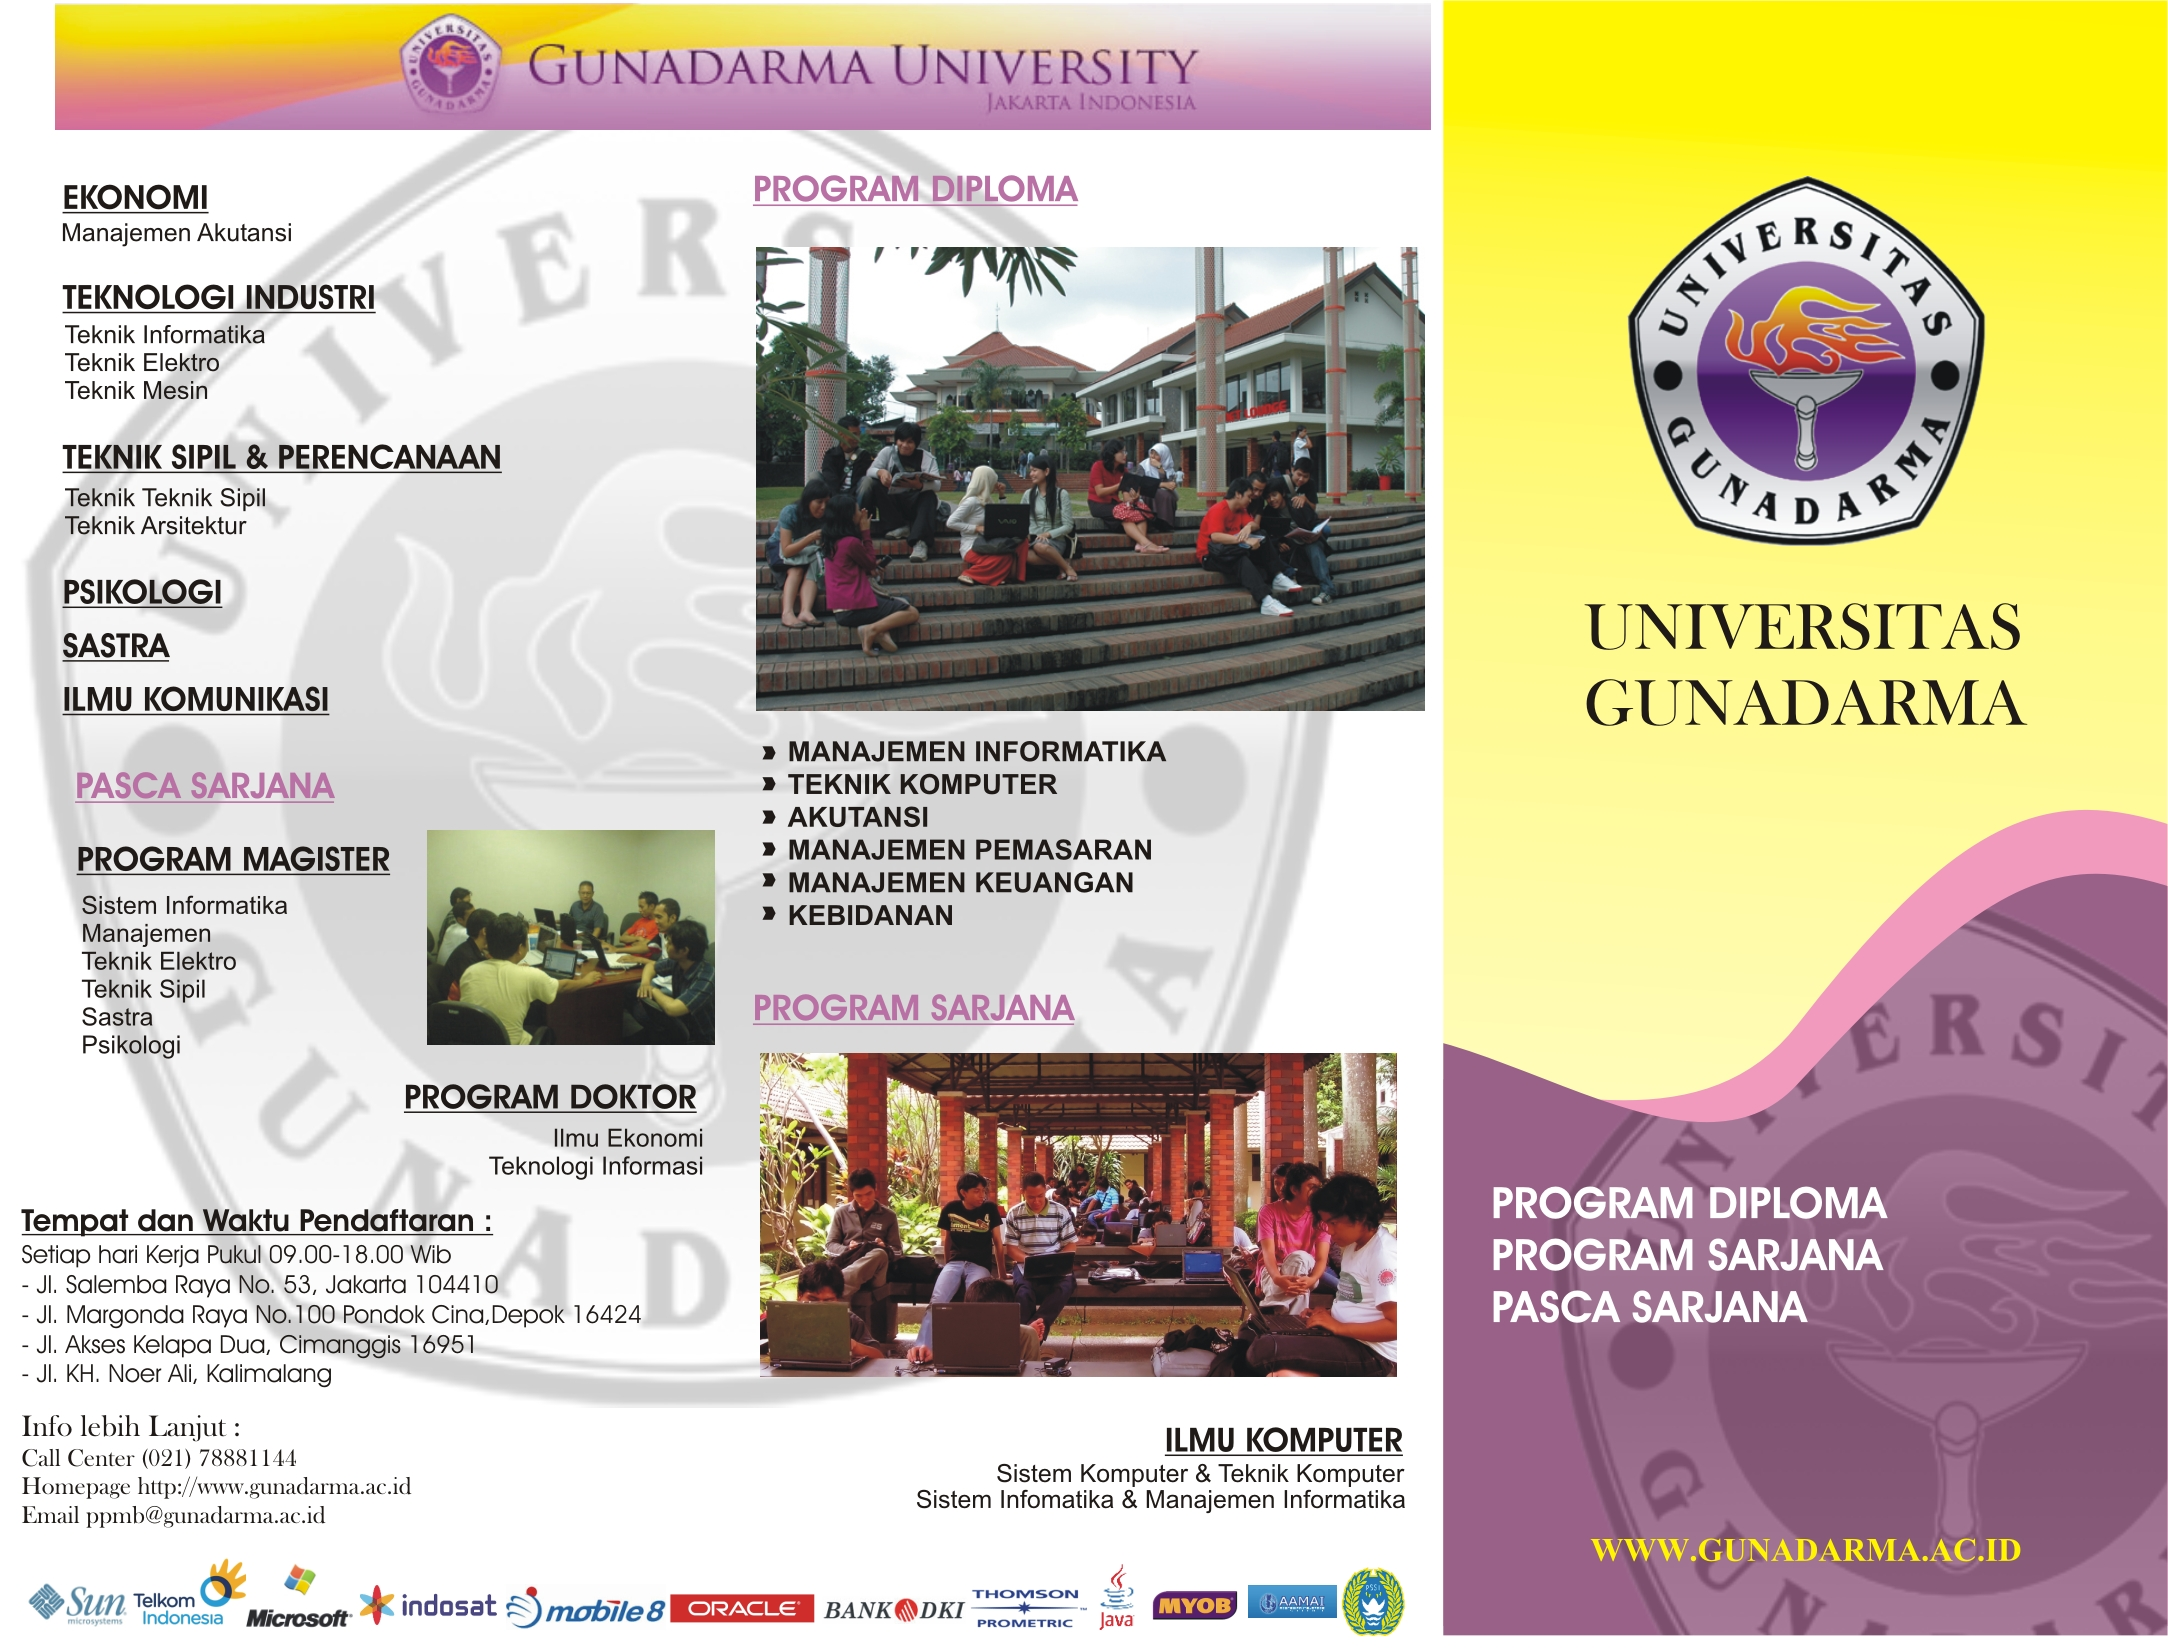 Brosure Gunadarma University Ilmu Komunikasi